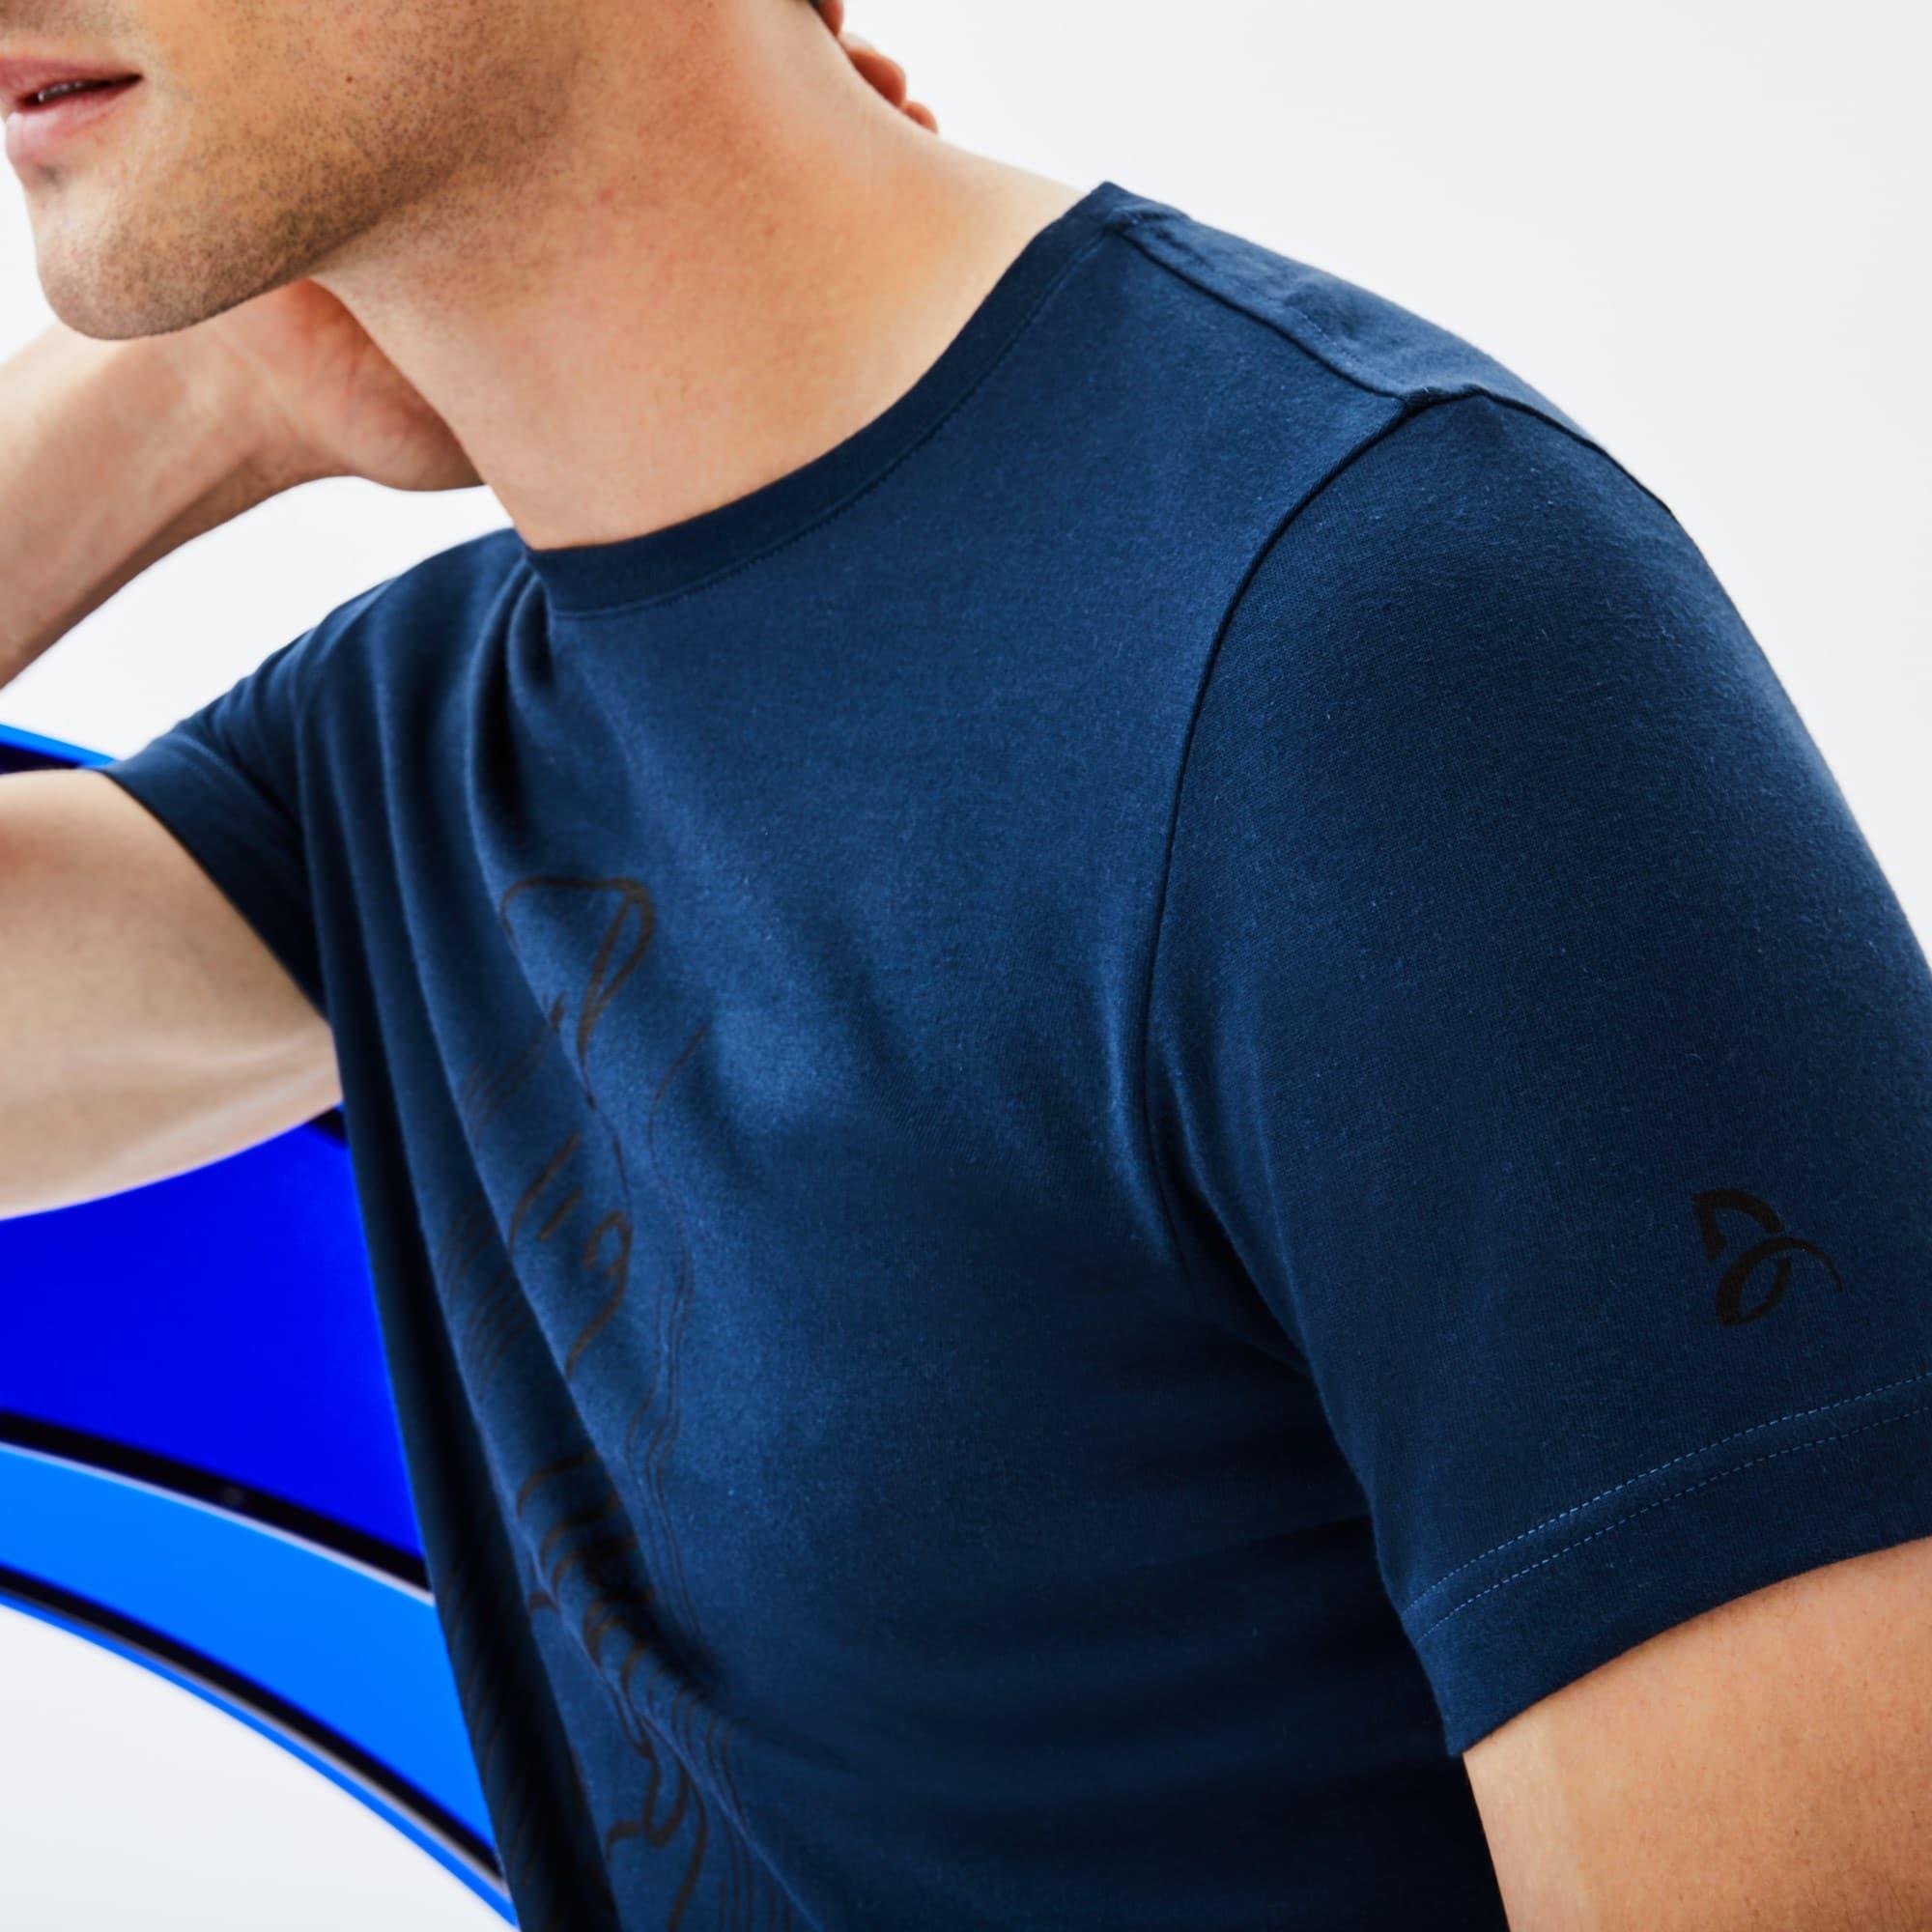 T-shirt col rond Lacoste SPORT Collection Novak Djokovic Support With Style - Off Court en jersey technique avec imprimé